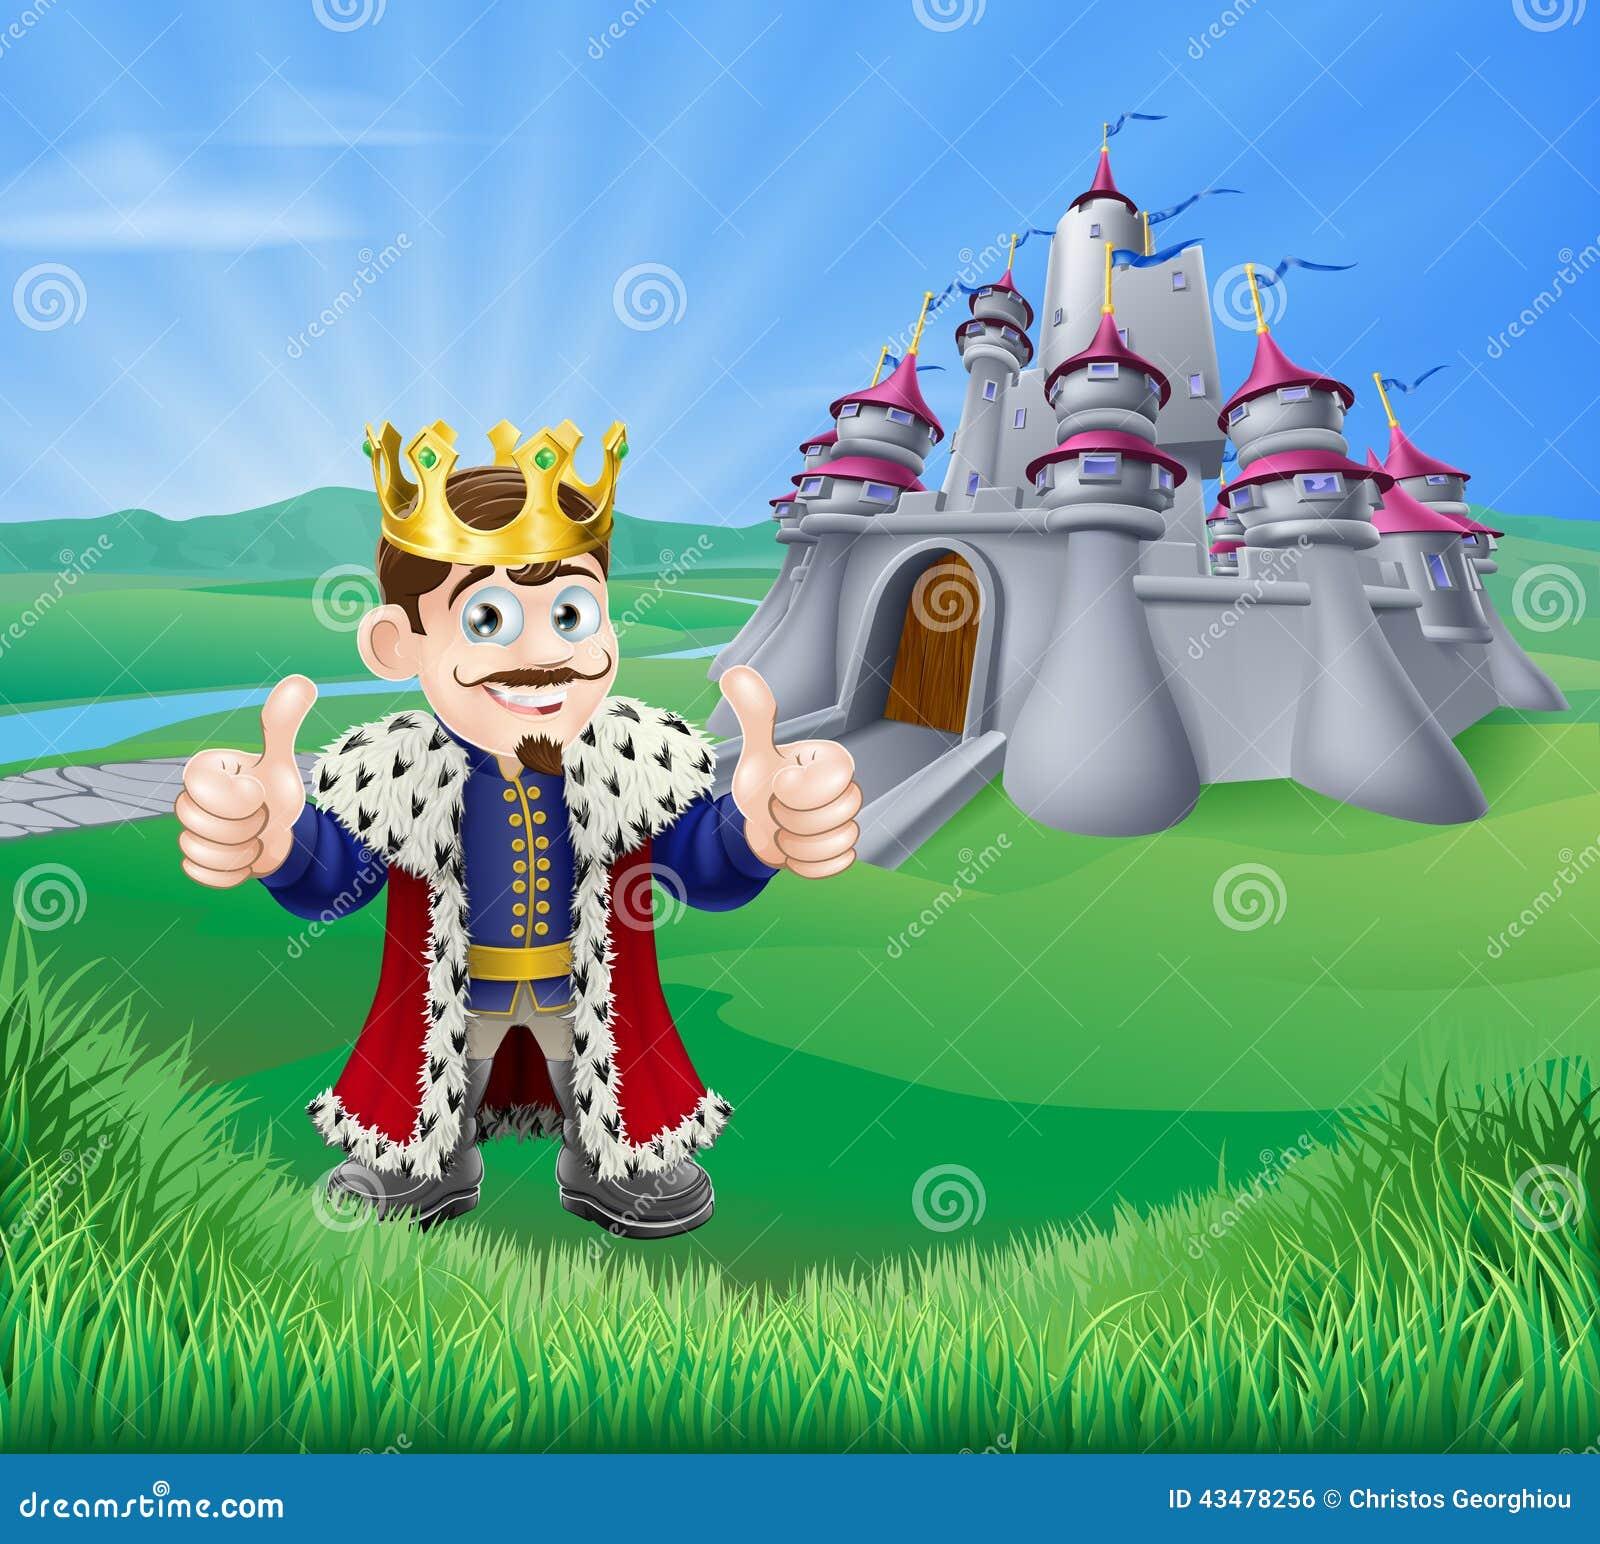 prince fairy tale clip art